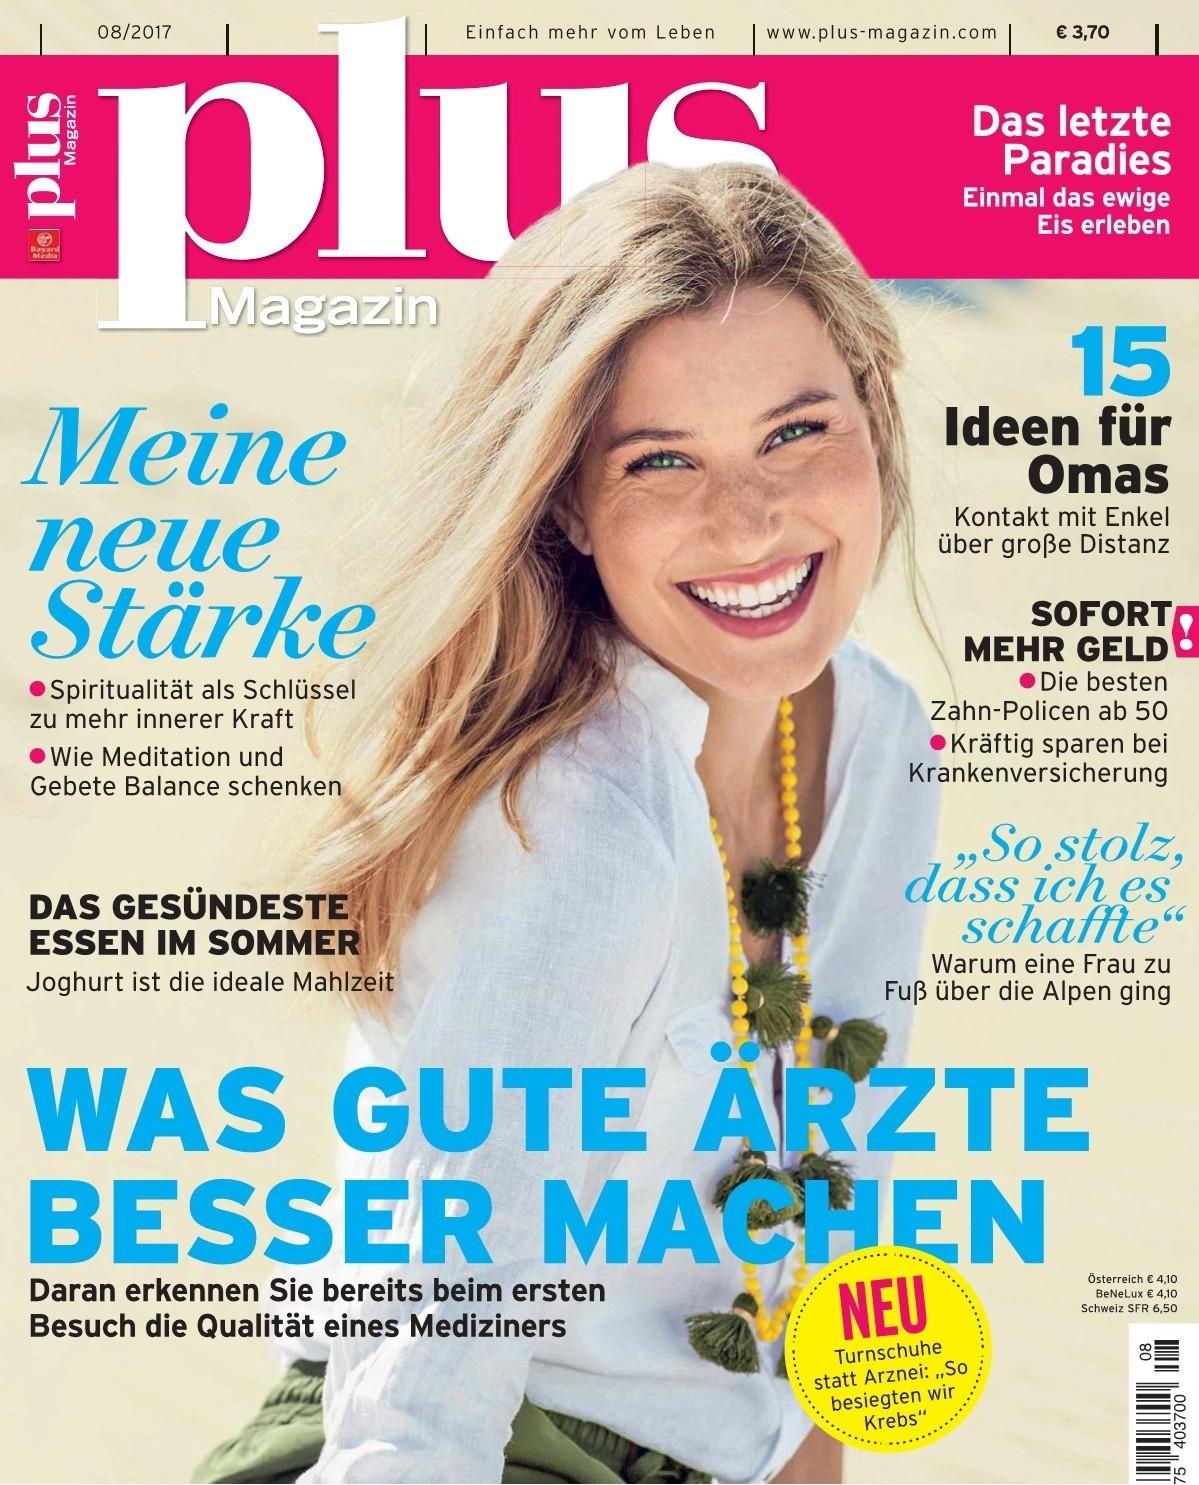 Aline Muller - plus mag 08-2017.jpg